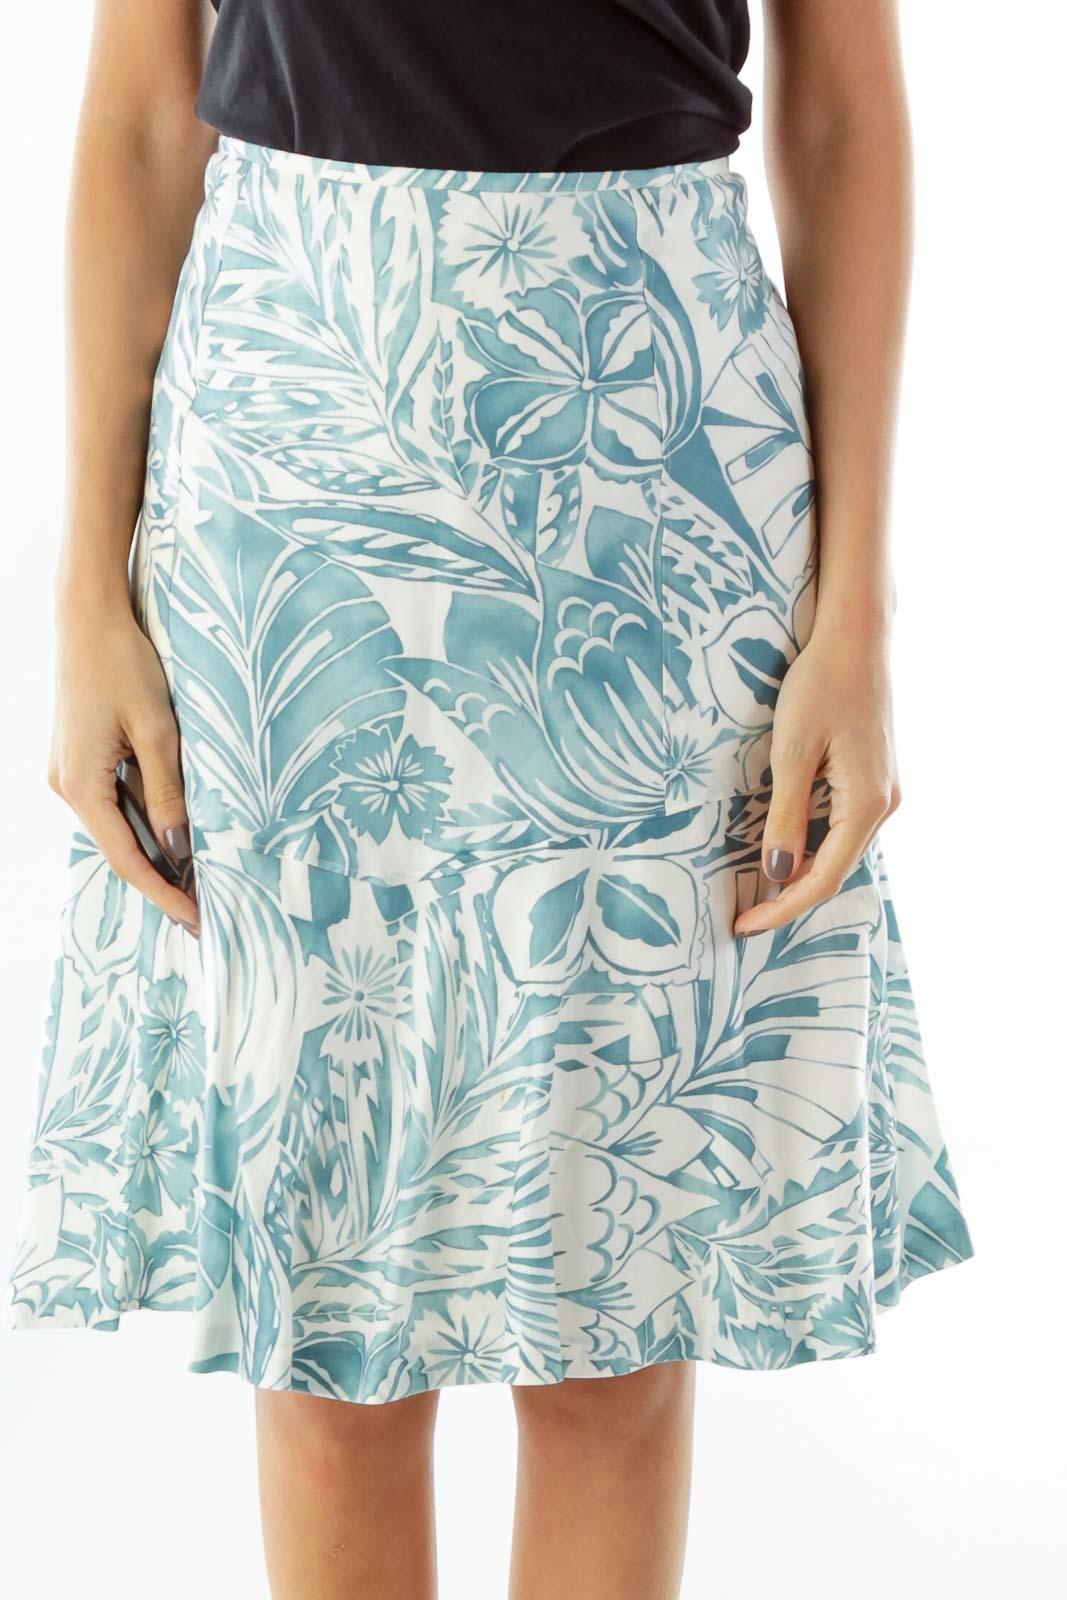 Blue White Print A-Line Skirt Front